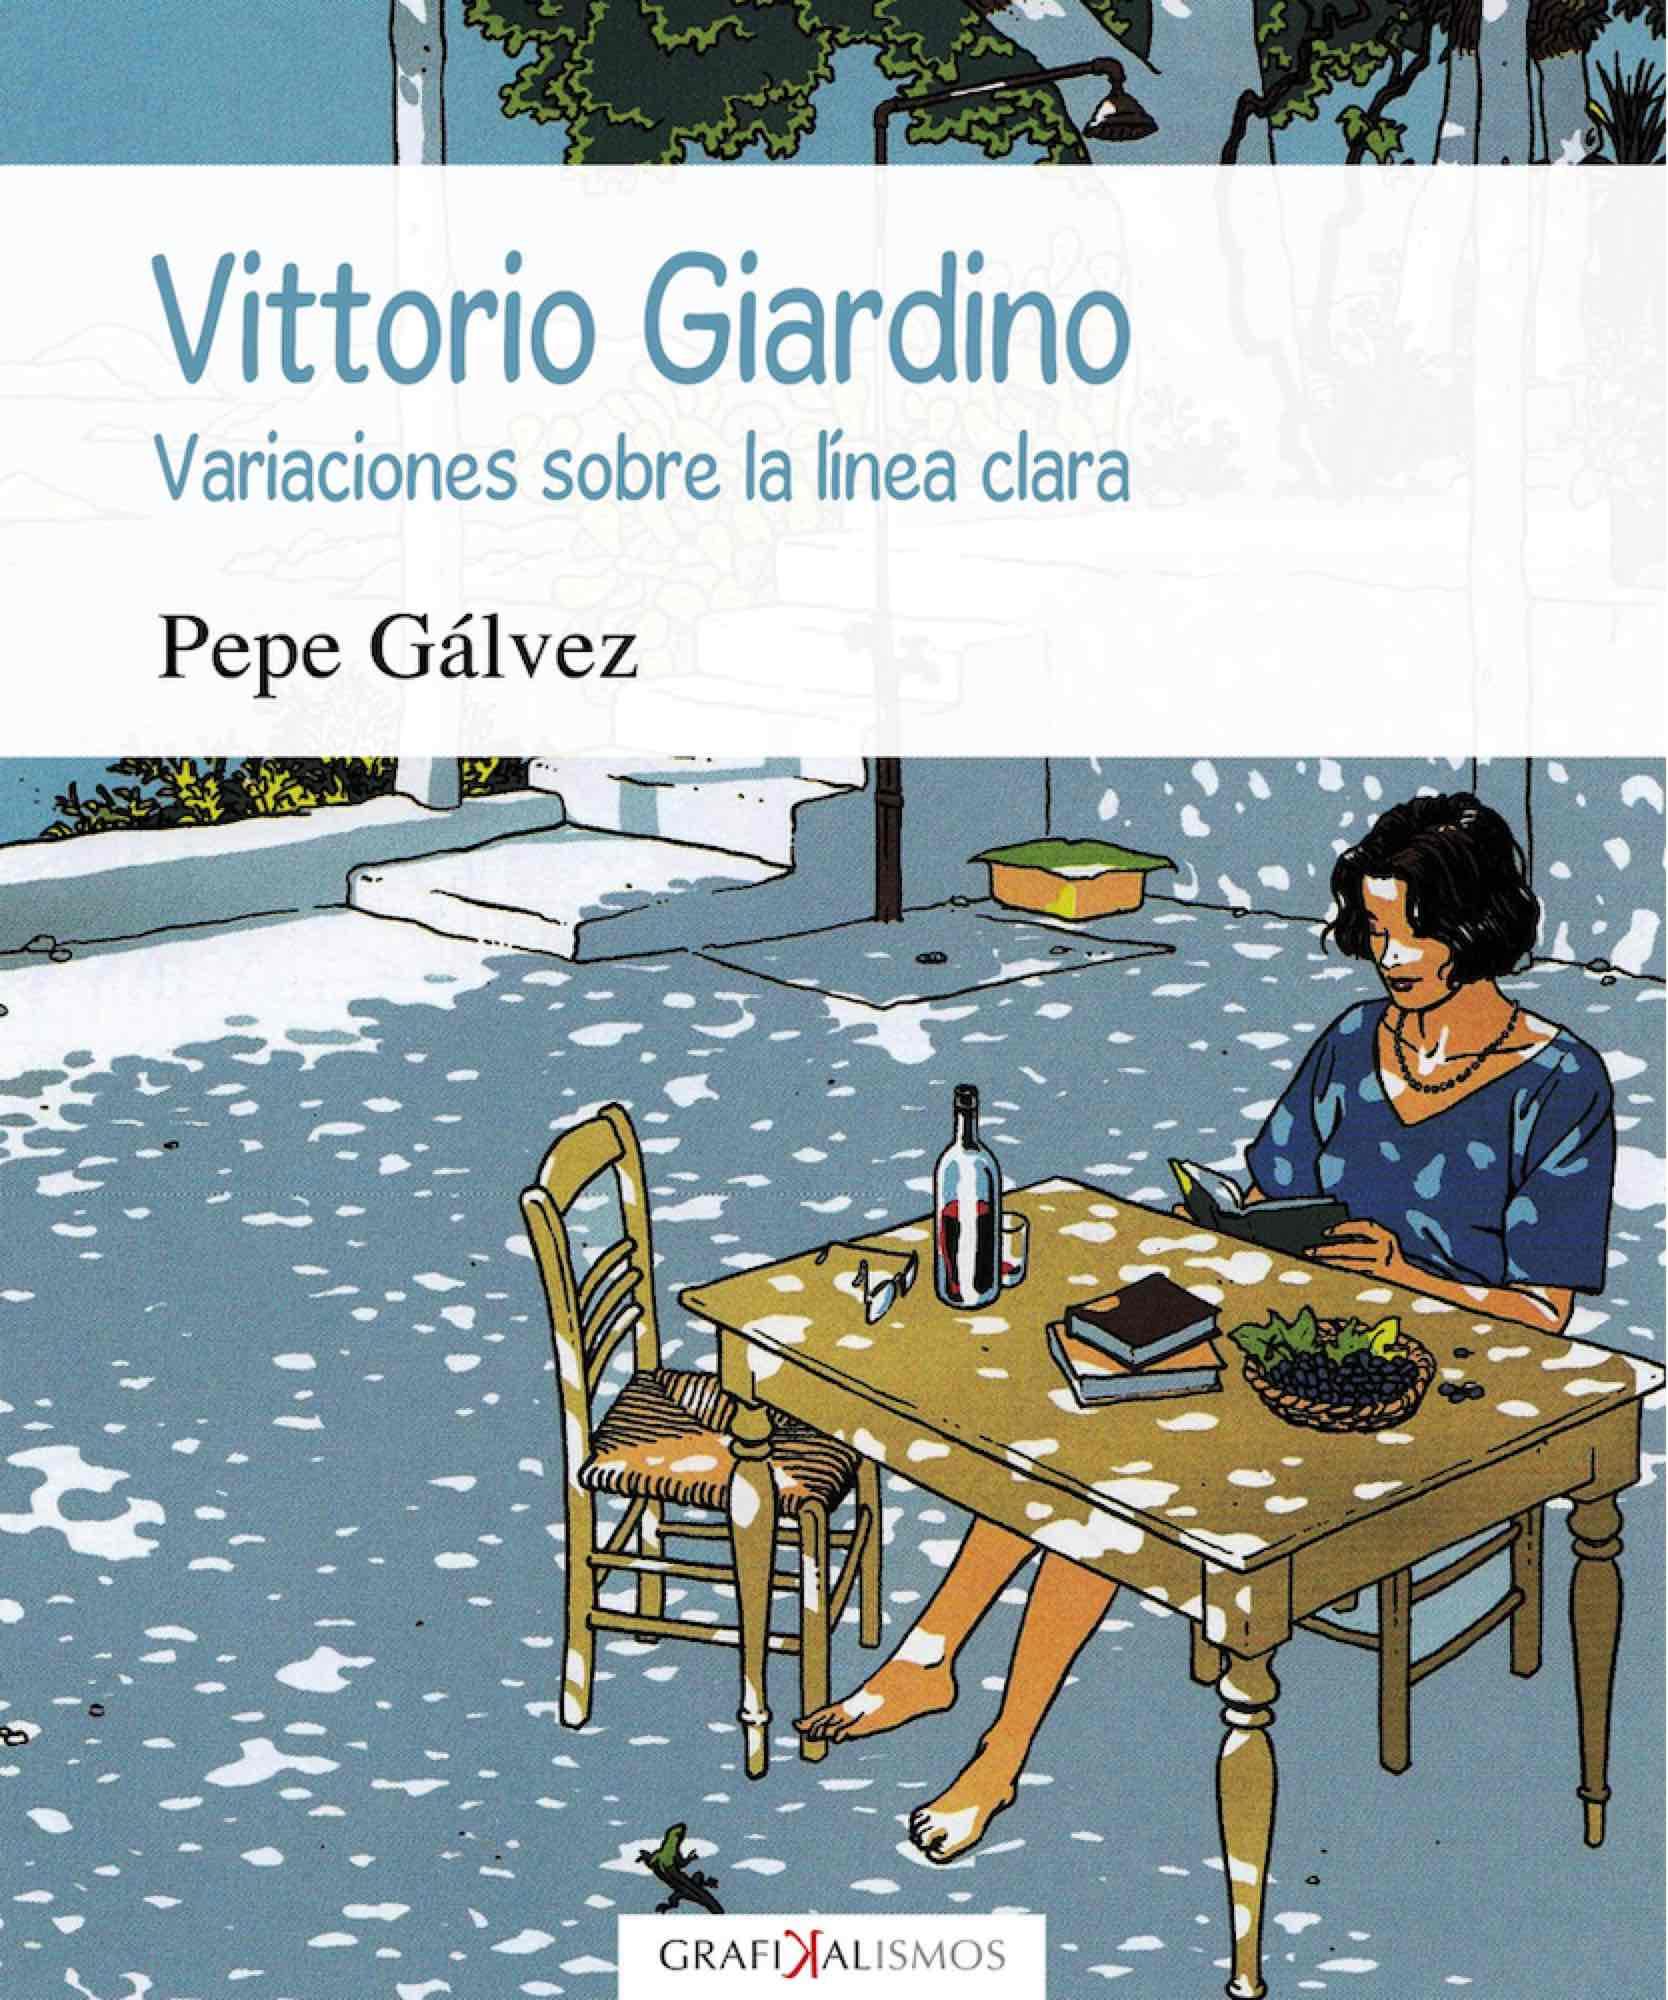 VITTORIO GIARDINO VARIACIONES SOBRE LA LINEA CLARA